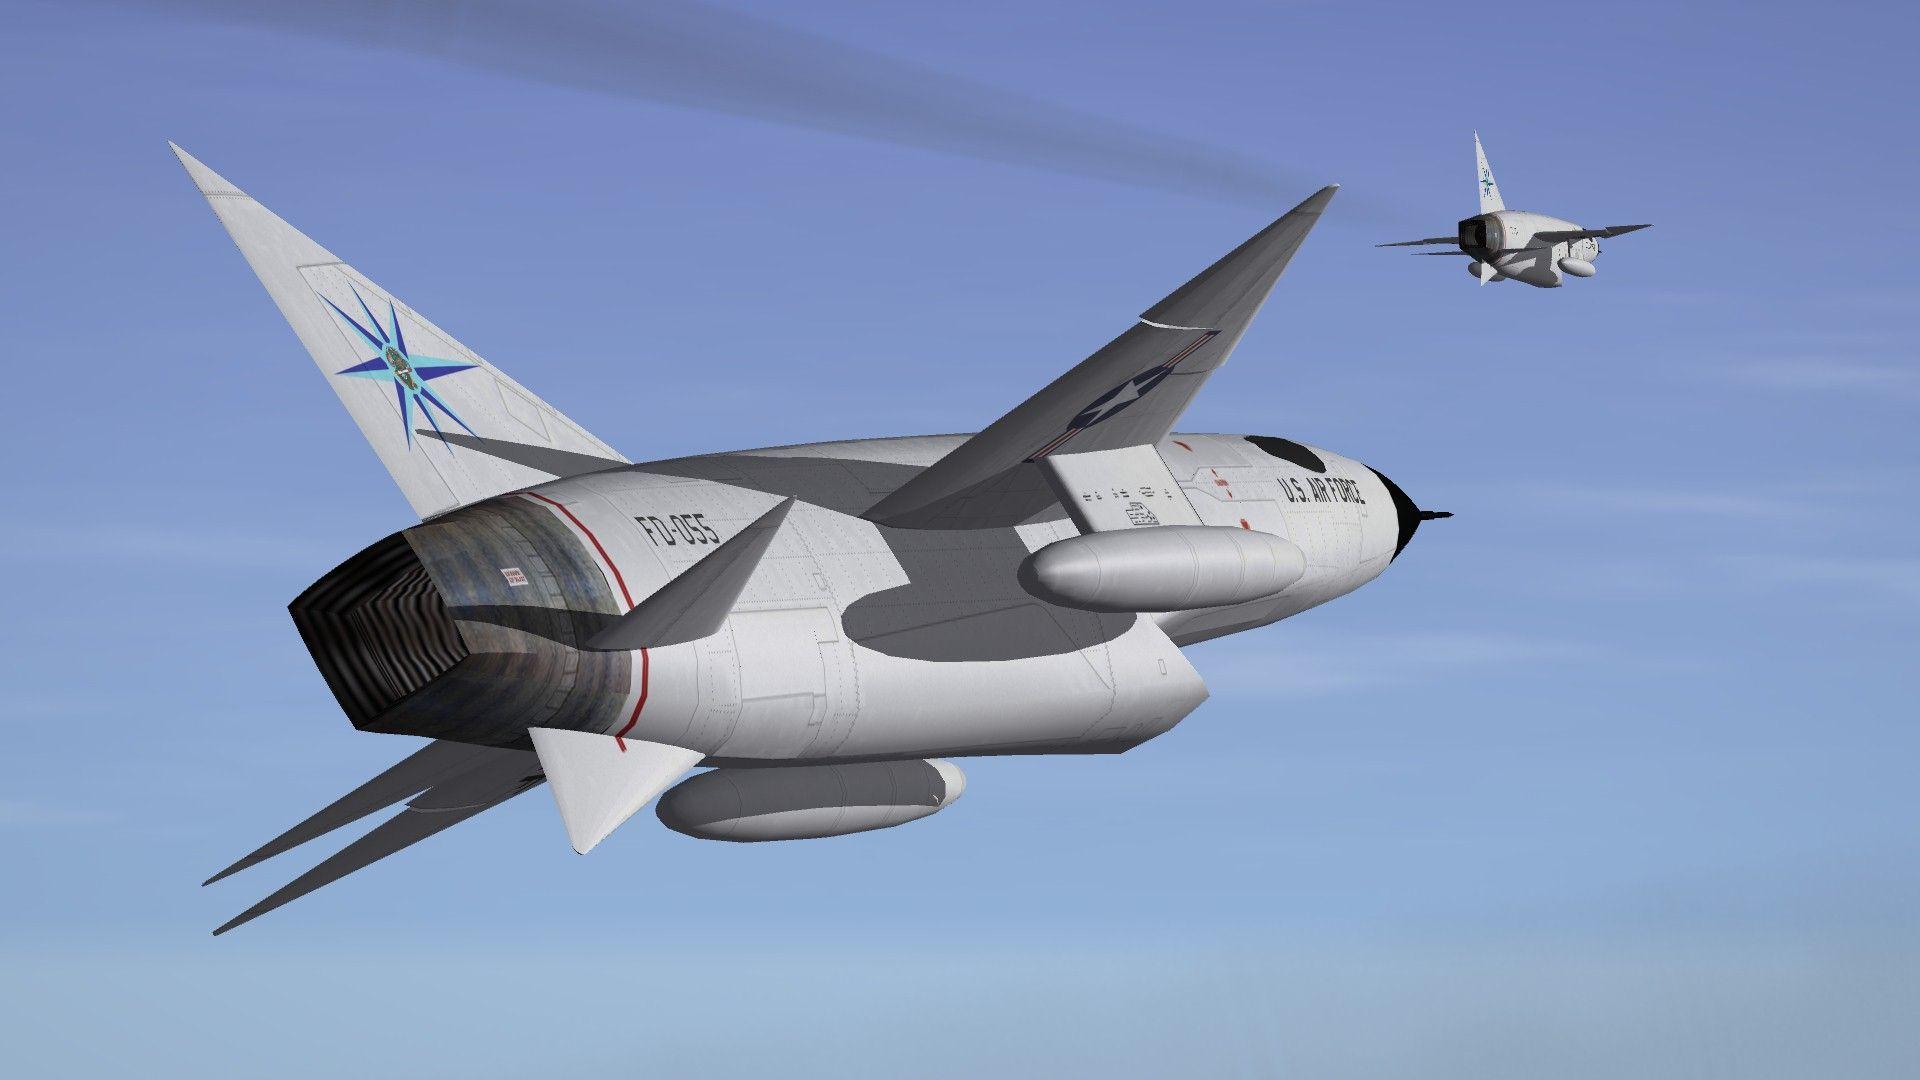 USAFF-103ATHUNDERWARRIOR04.jpg